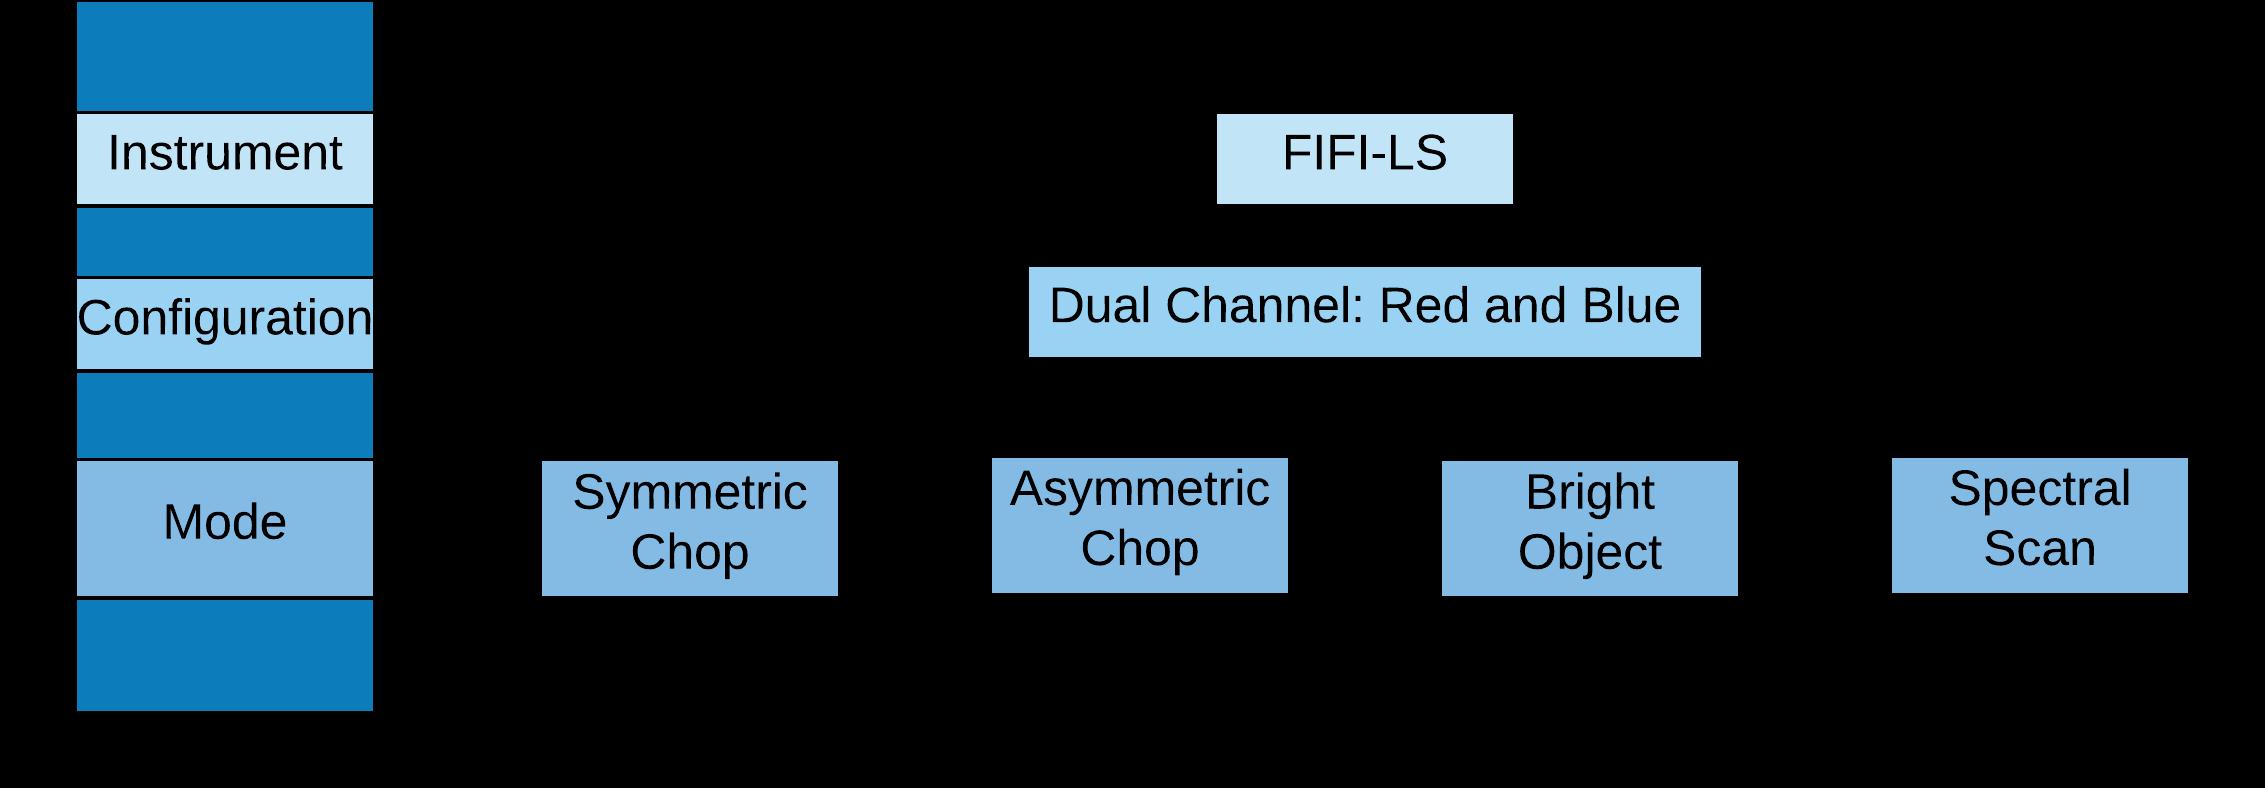 FIFI-LS configuration and mode flowchart diagram